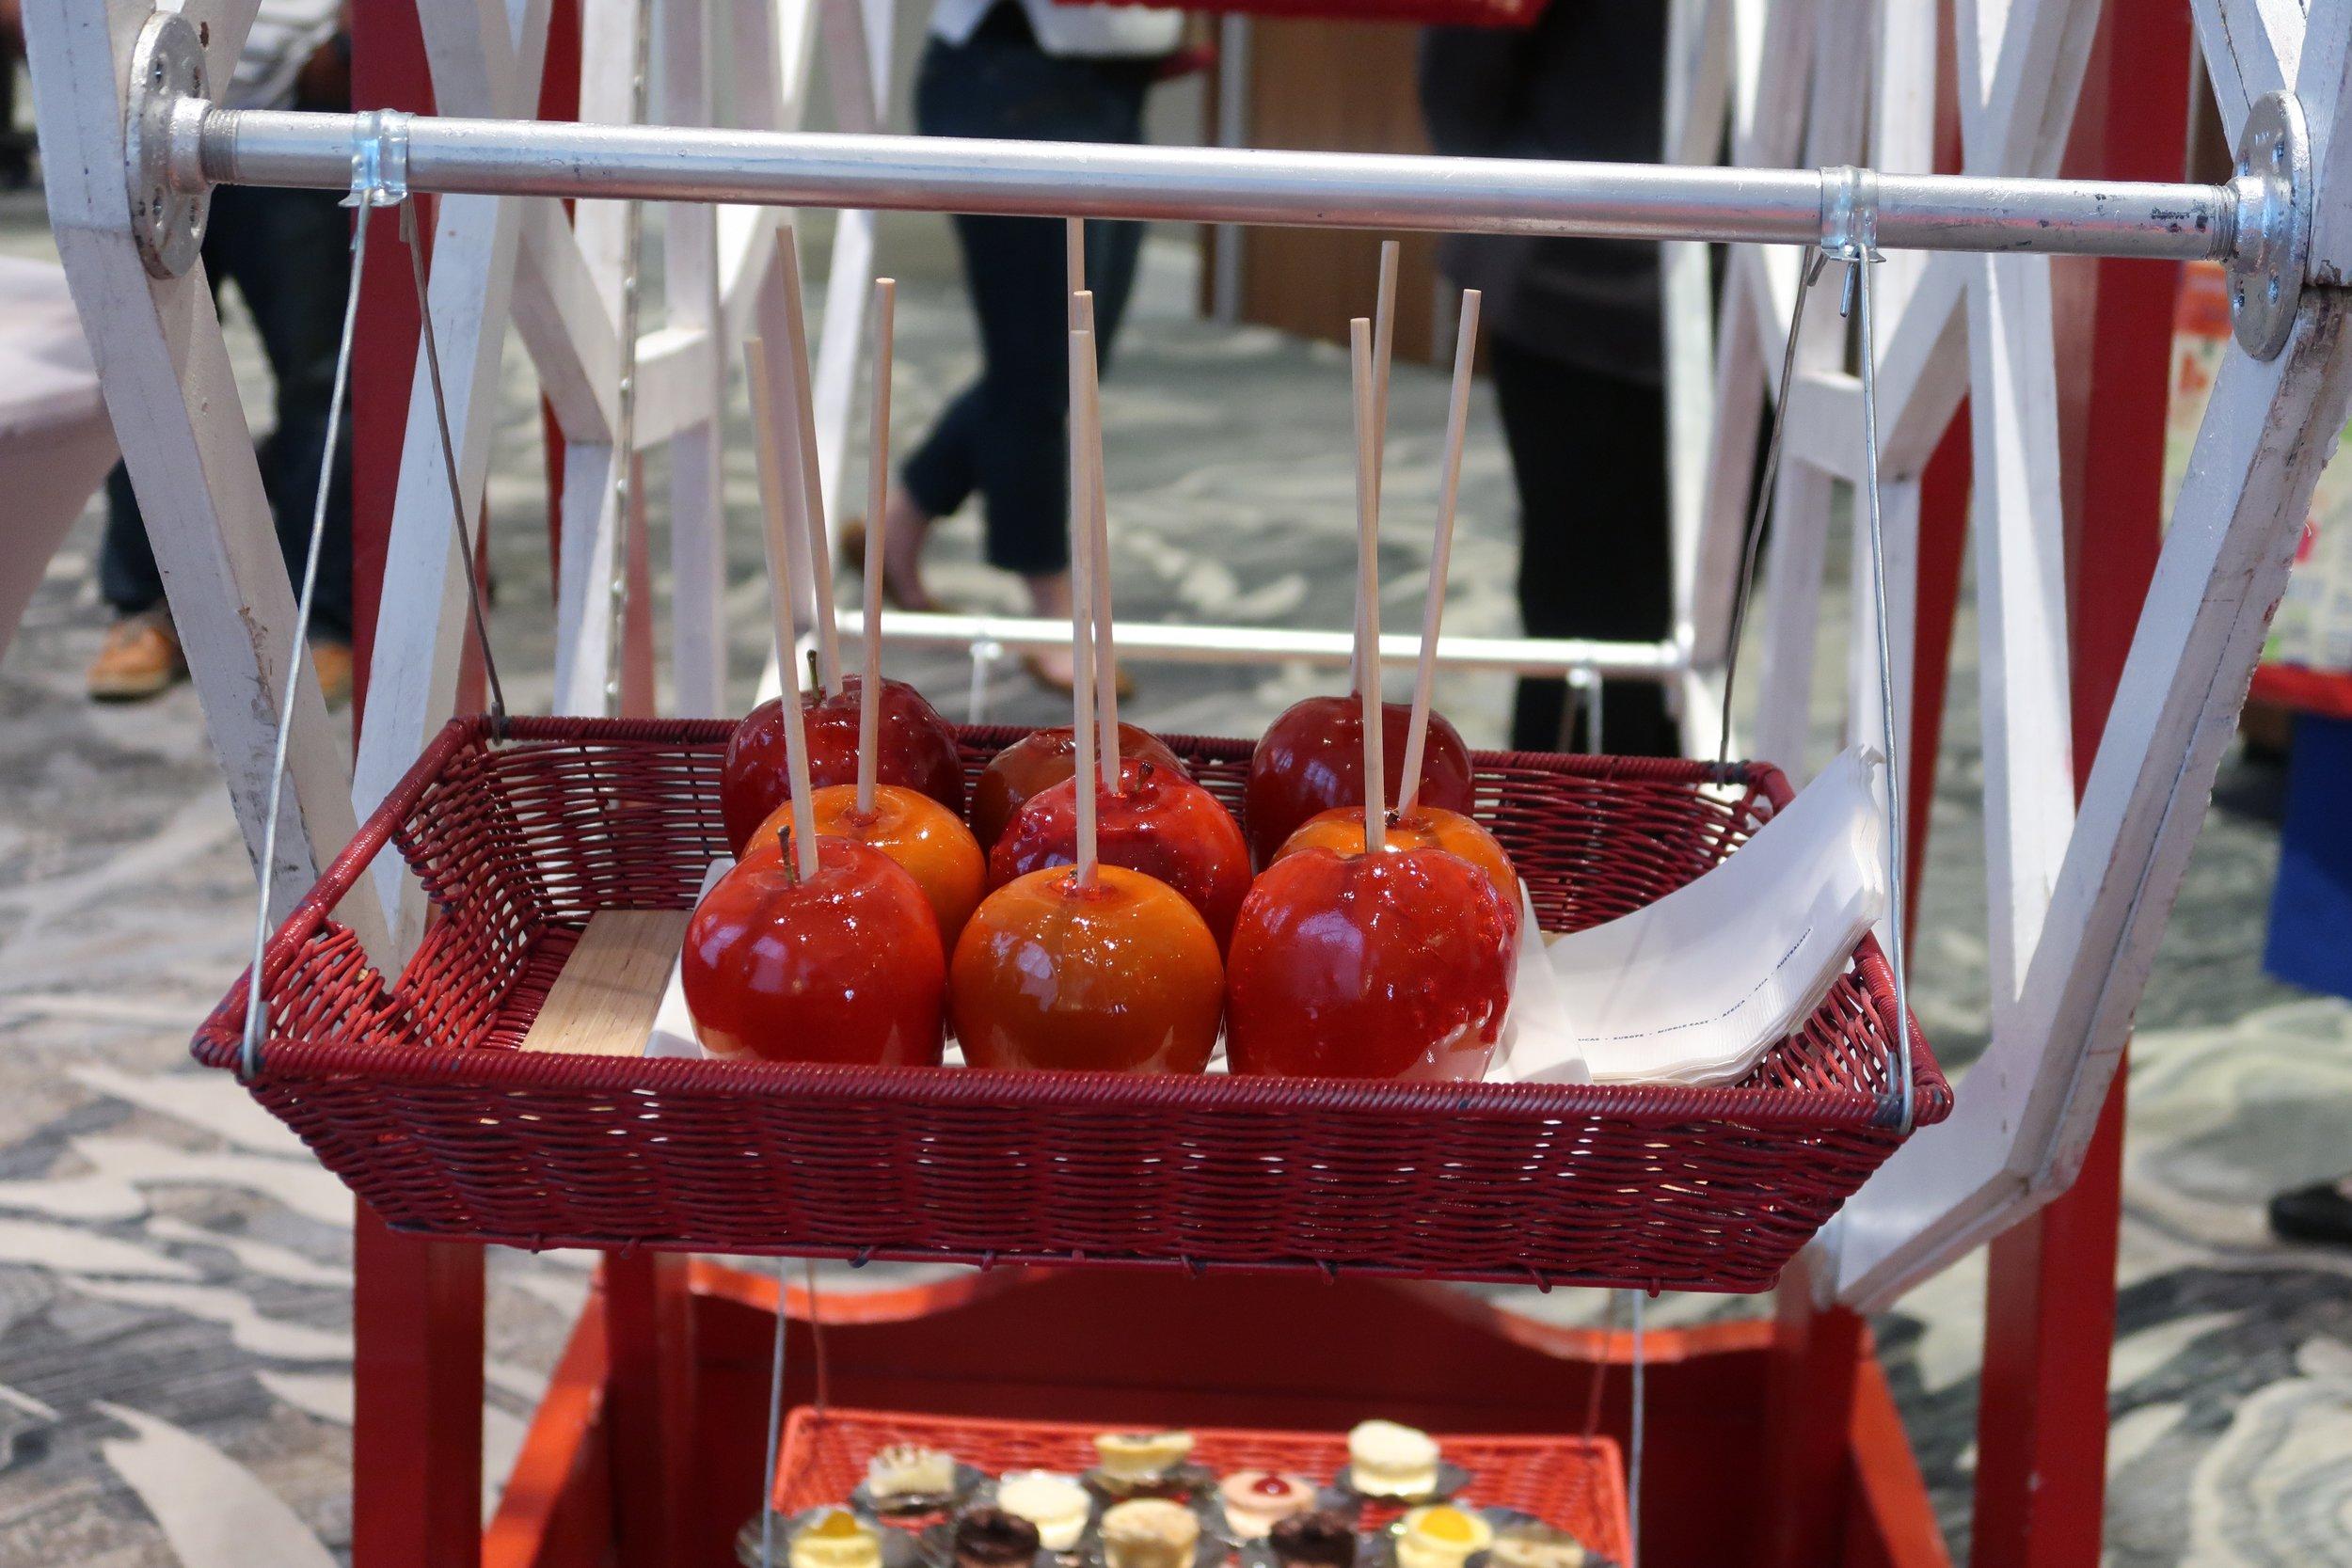 VASHRM candy apples.jpg